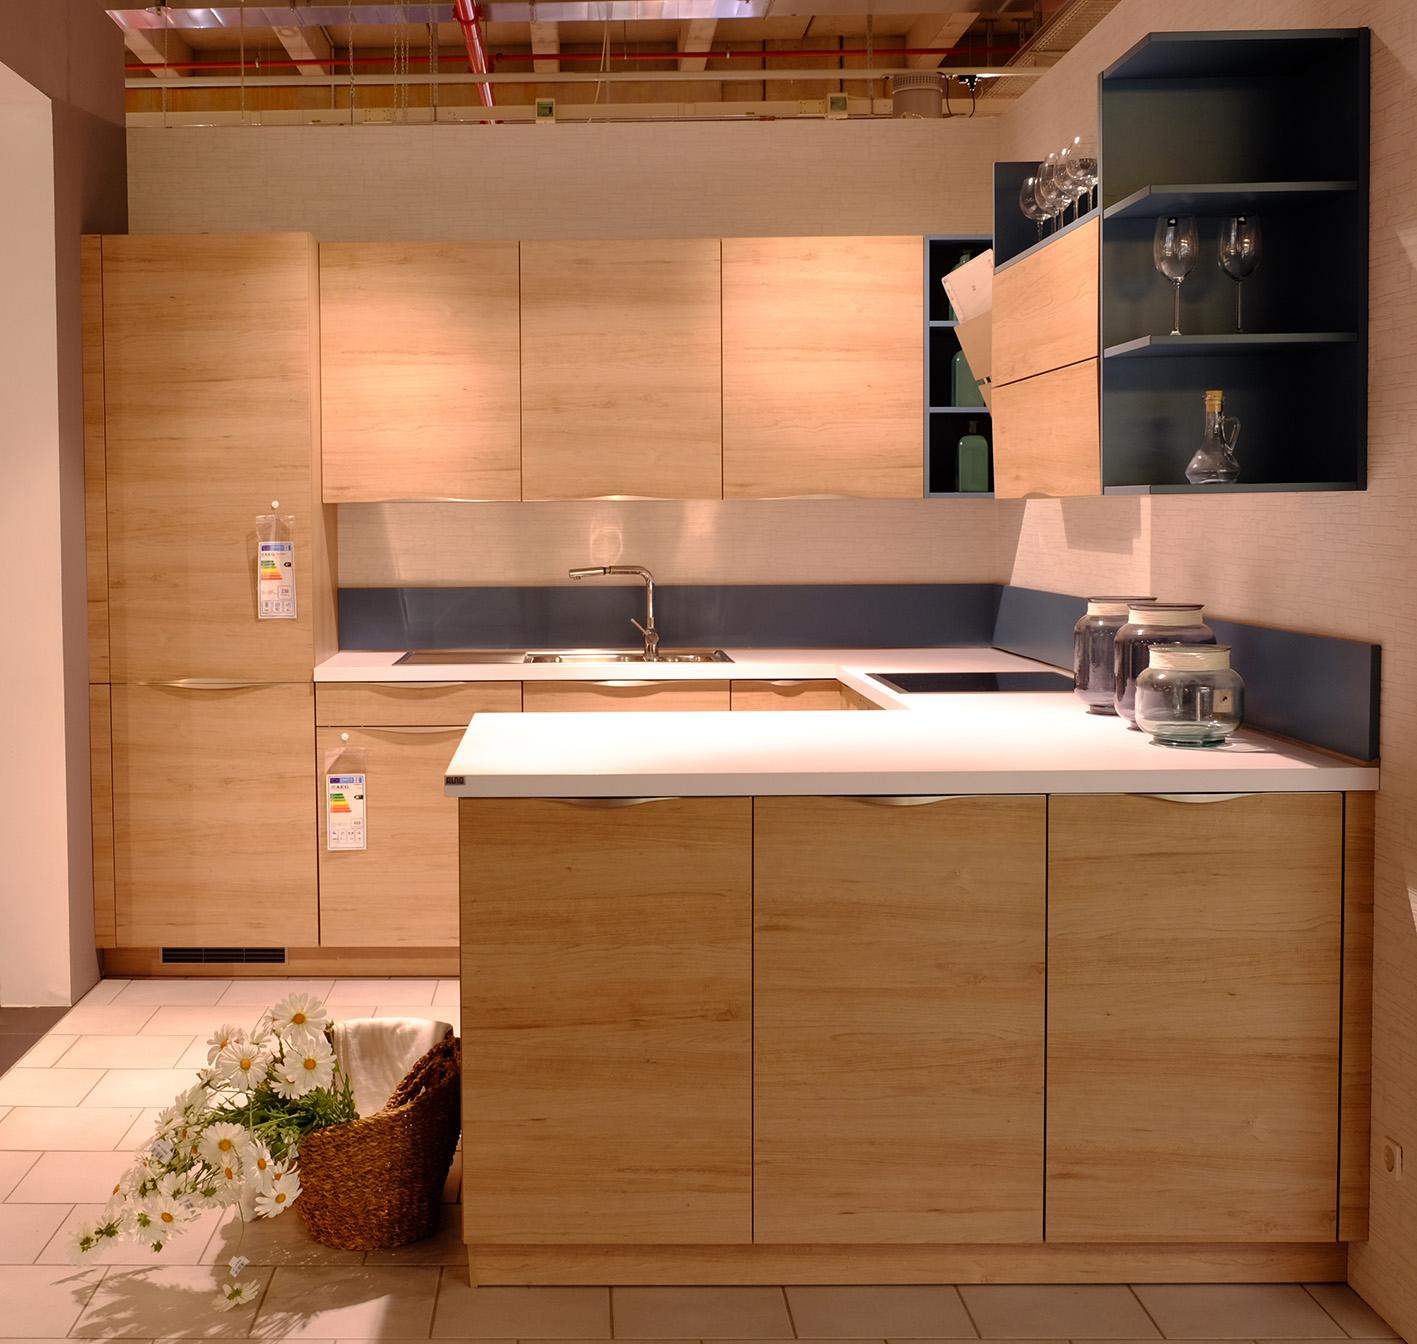 alno plan kueche kaufen moebelarena waldshut rheinfelden 4. Black Bedroom Furniture Sets. Home Design Ideas